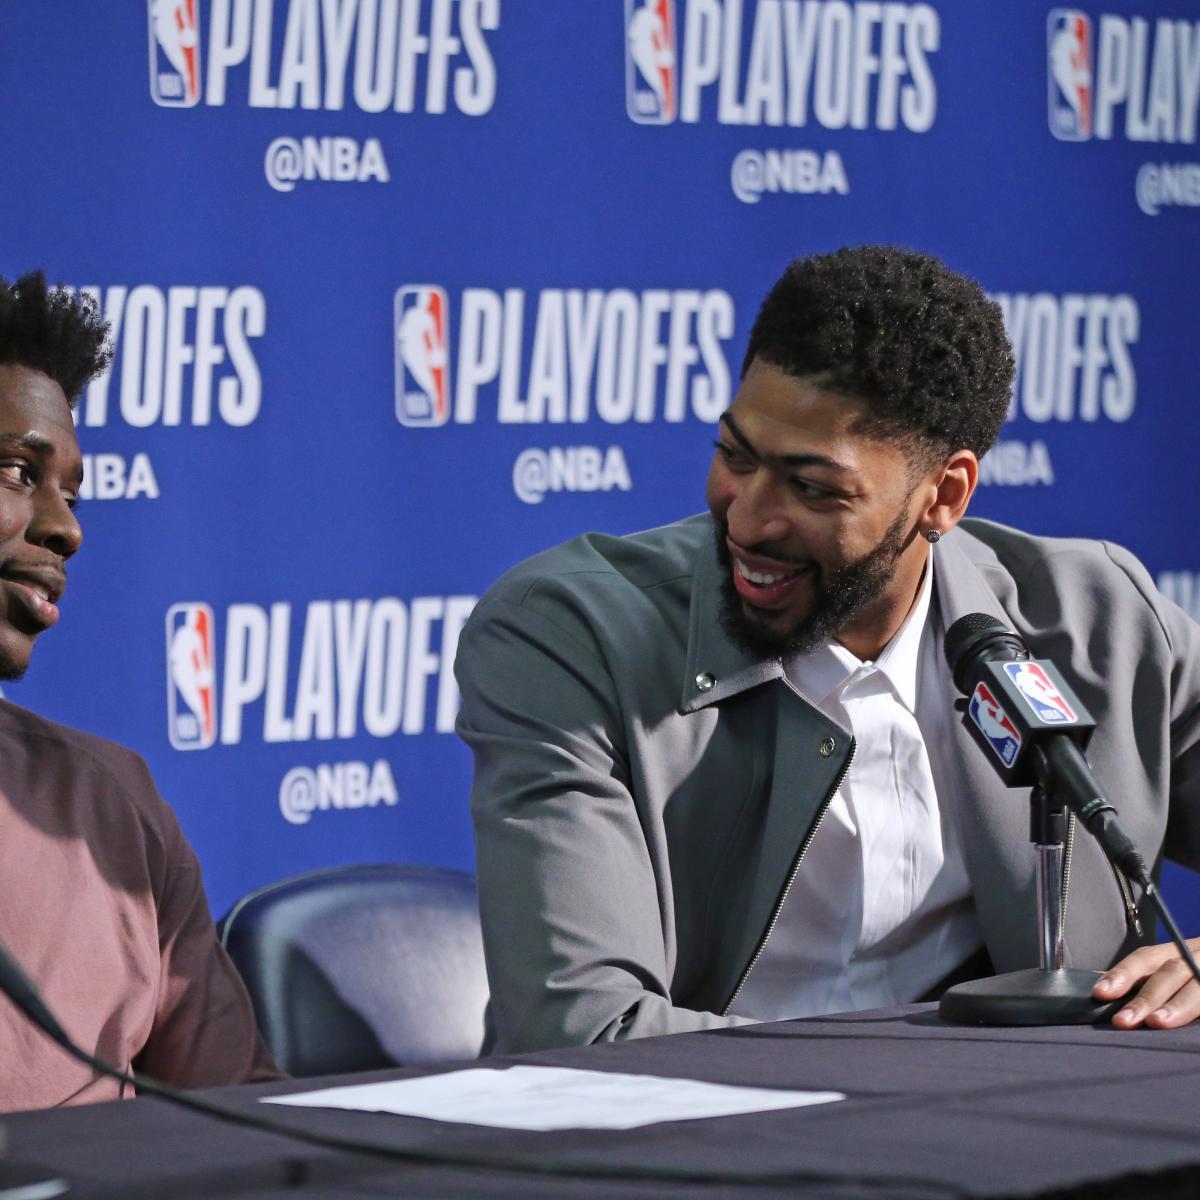 Rockets Vs Warriors Full Game 2019: Warriors Pelicans Game 2 Full Highlights